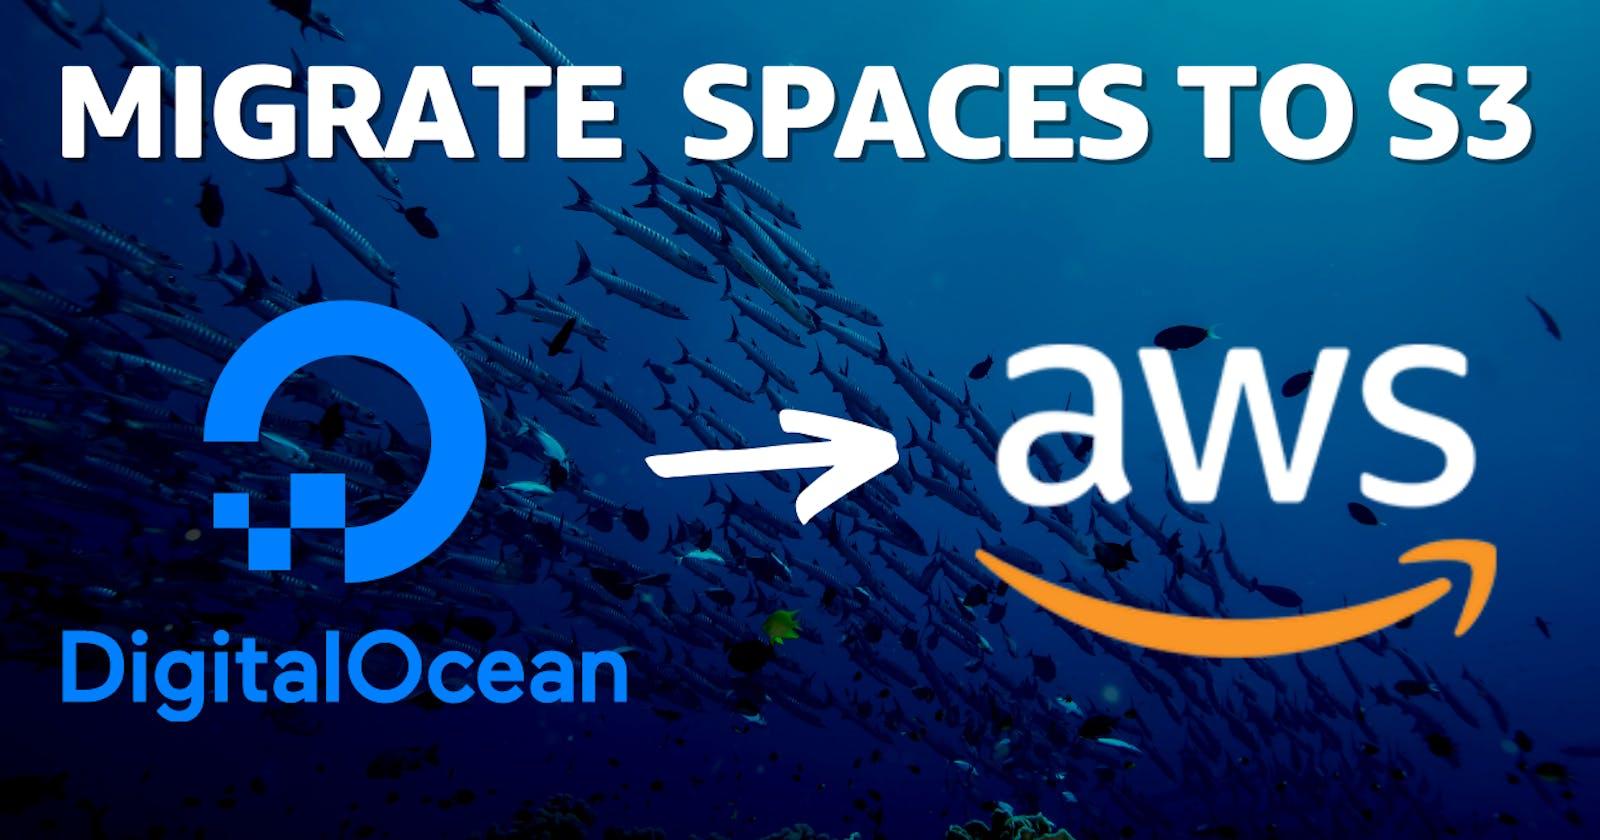 Migrating DigitalOcean Spaces to an Amazon S3 Bucket